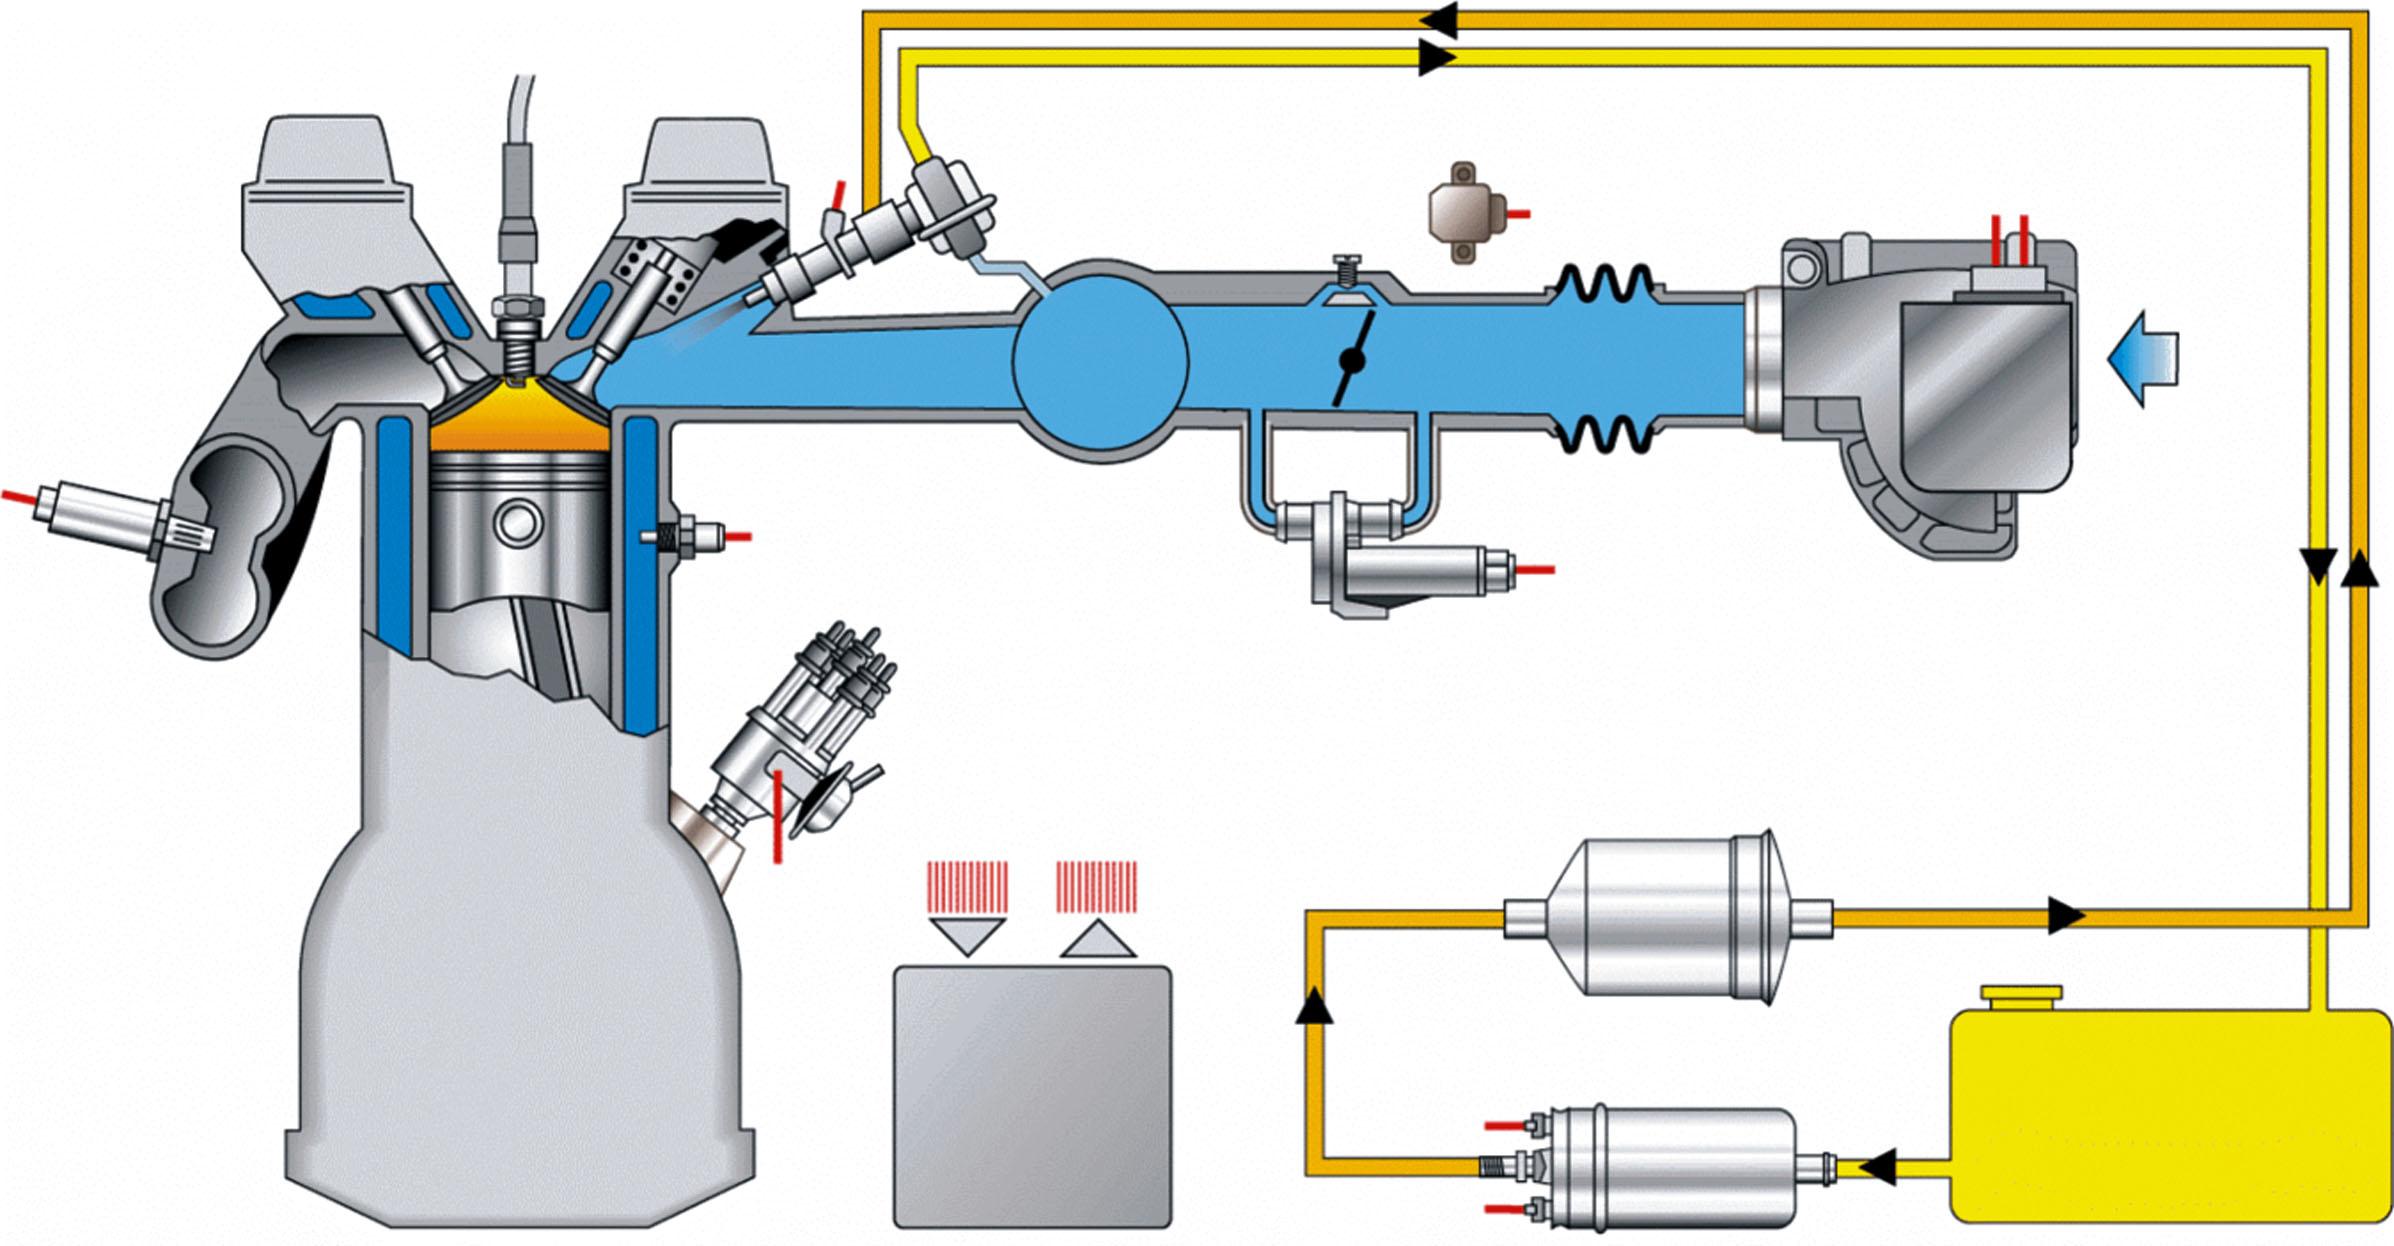 Схема точечного впрыска SPFI